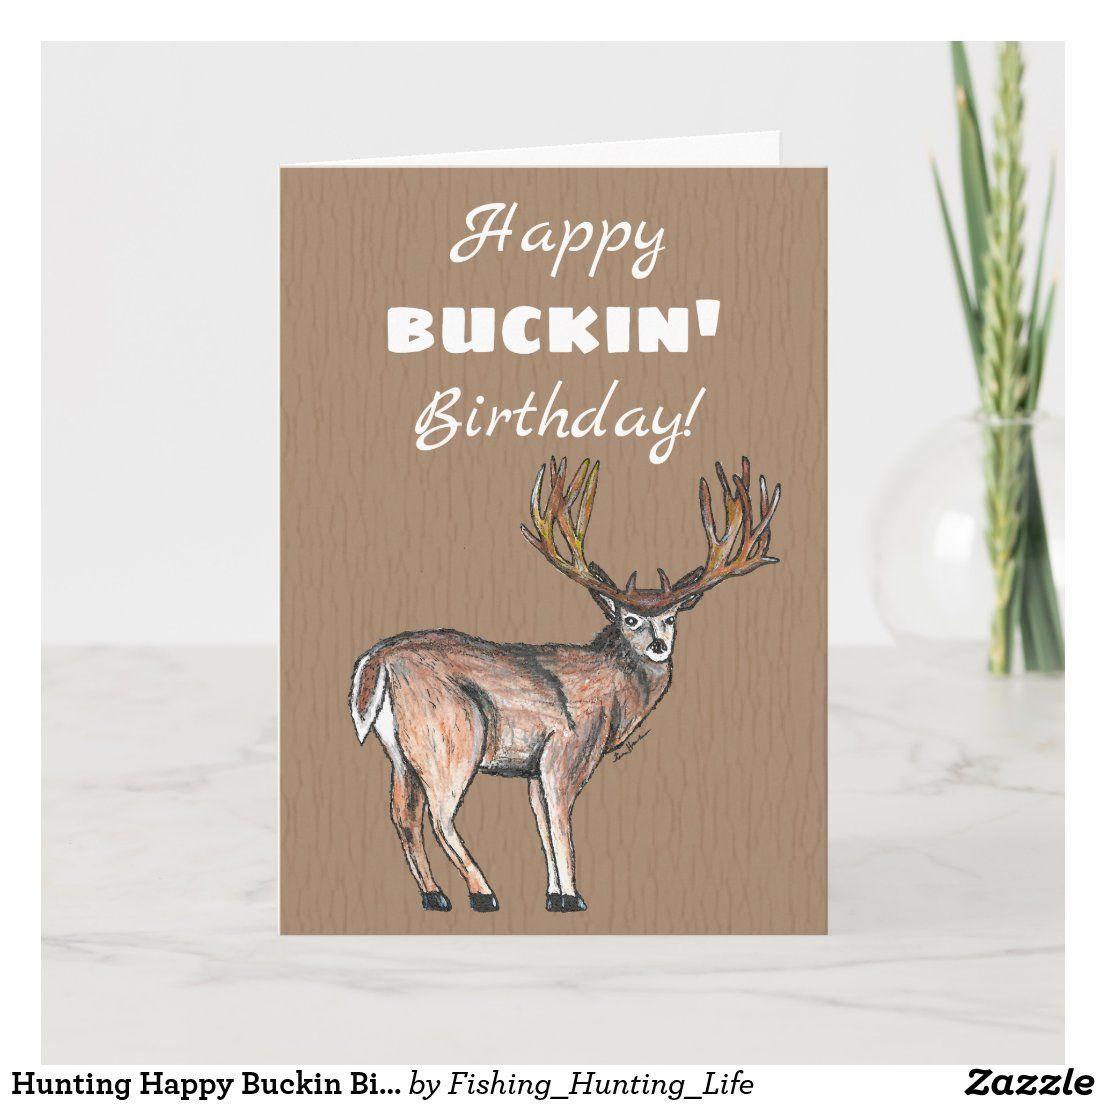 Hunting Happy Buckin Birthday Card Zazzle Com Birthday Cards Dad Birthday Card Hunting Birthday